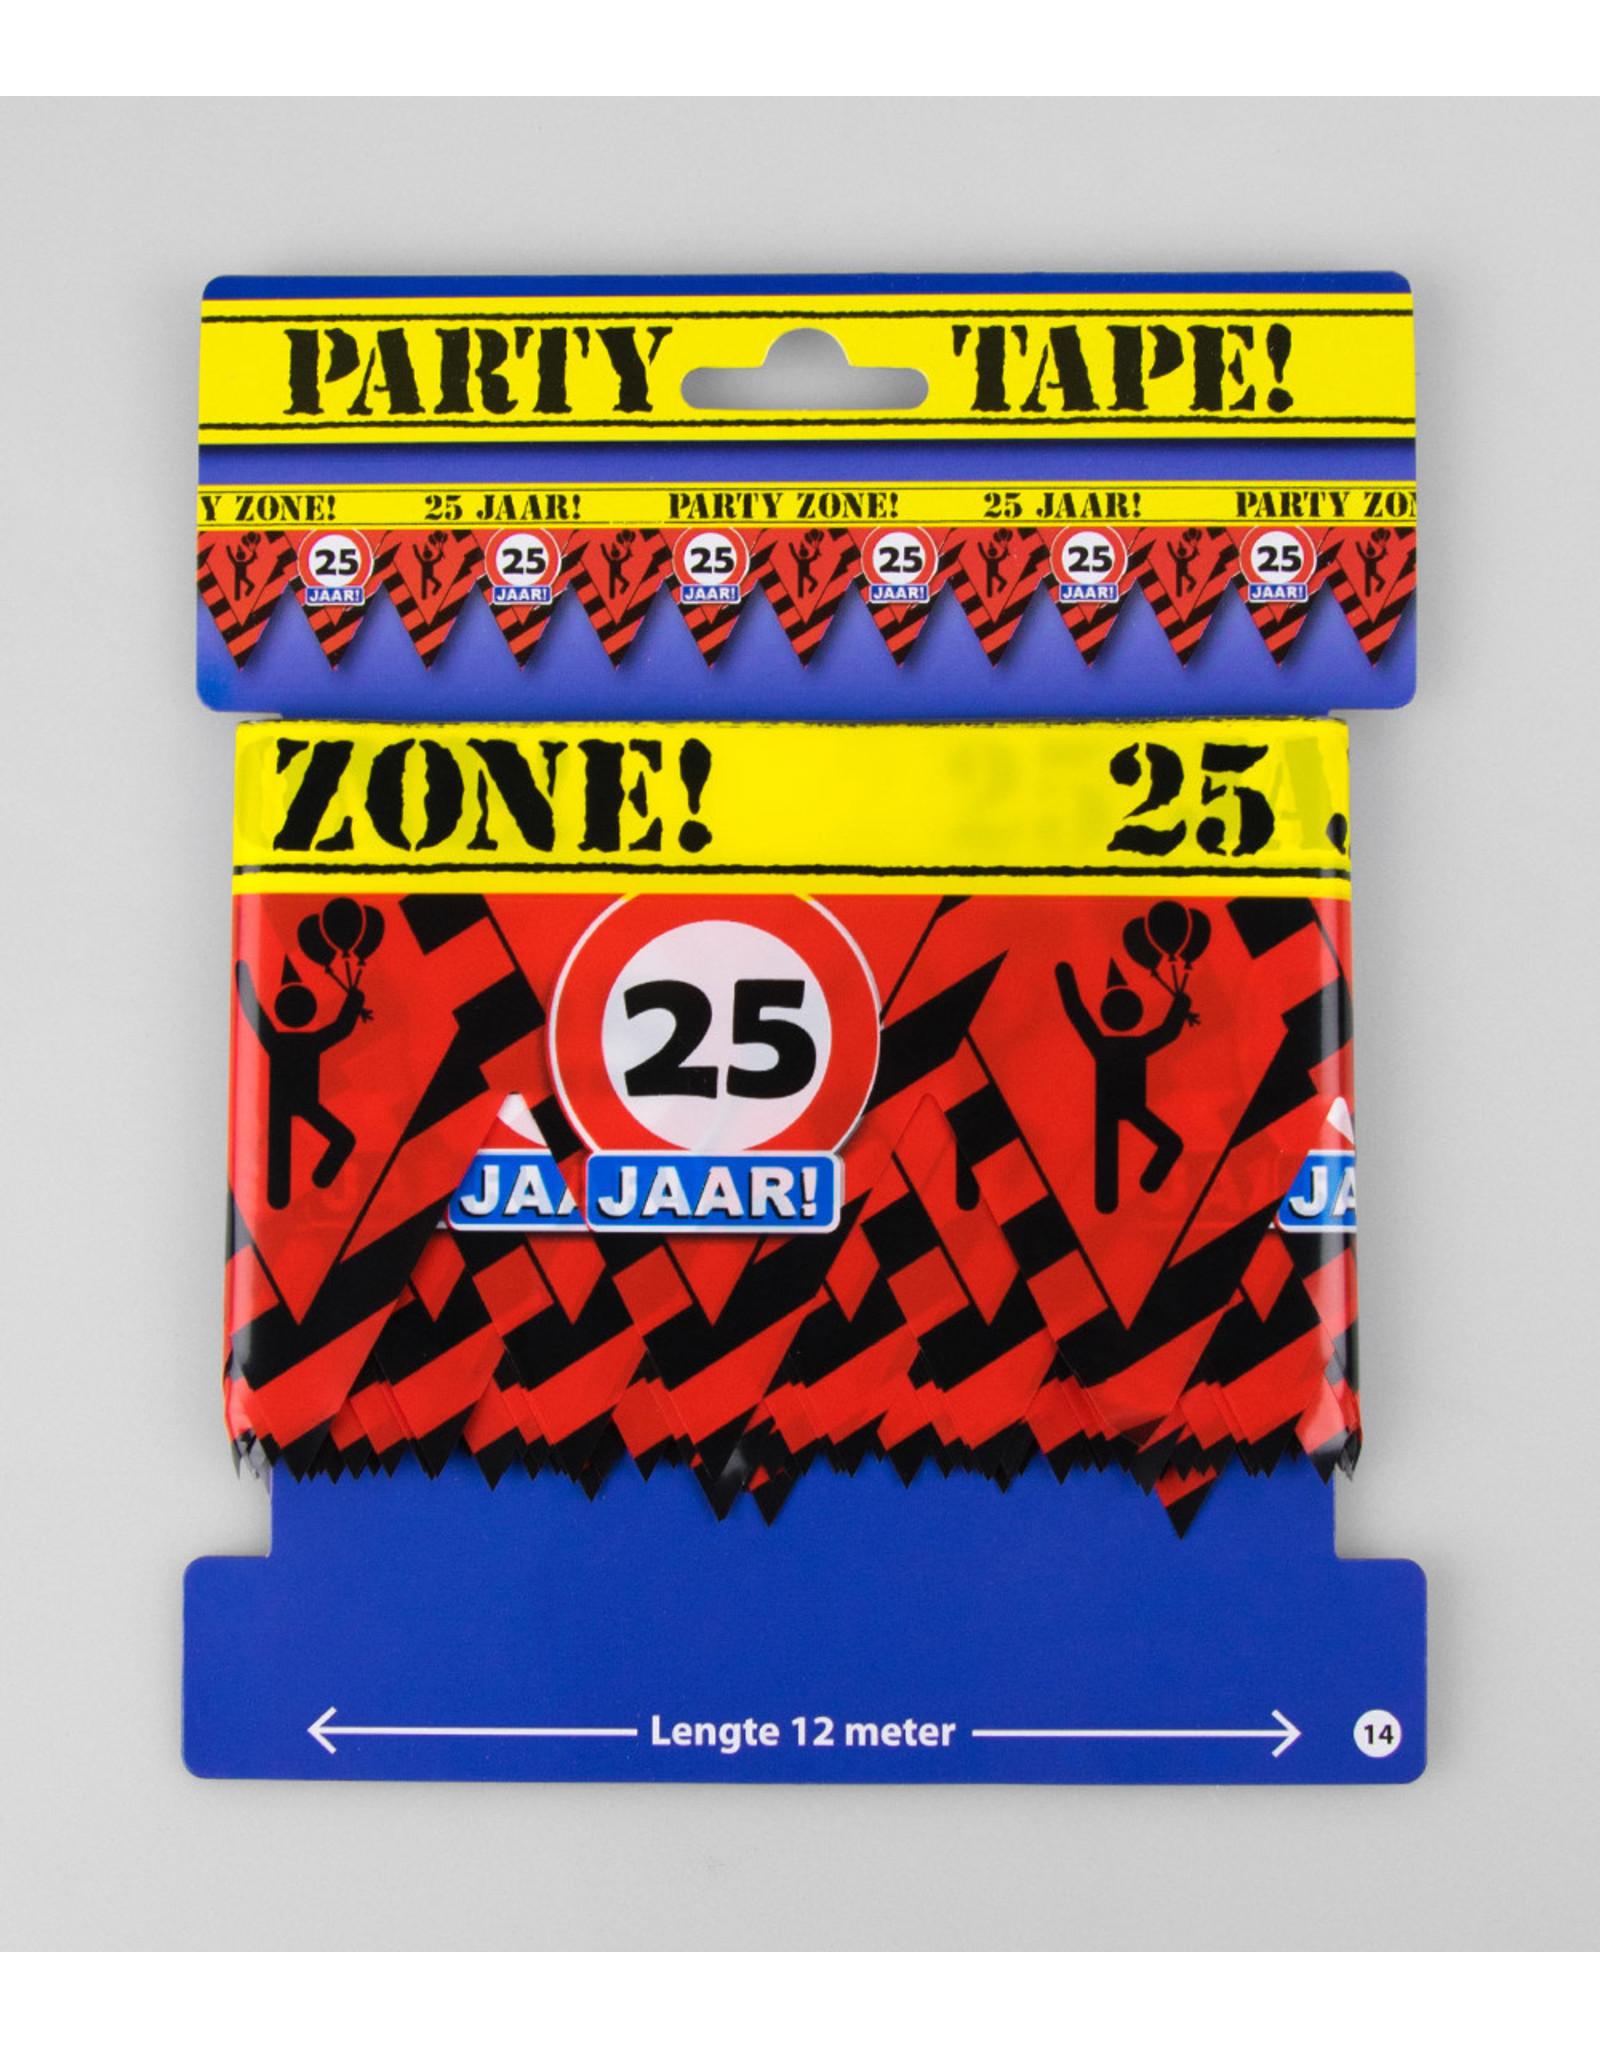 Afzetlint party zone 25 jaar